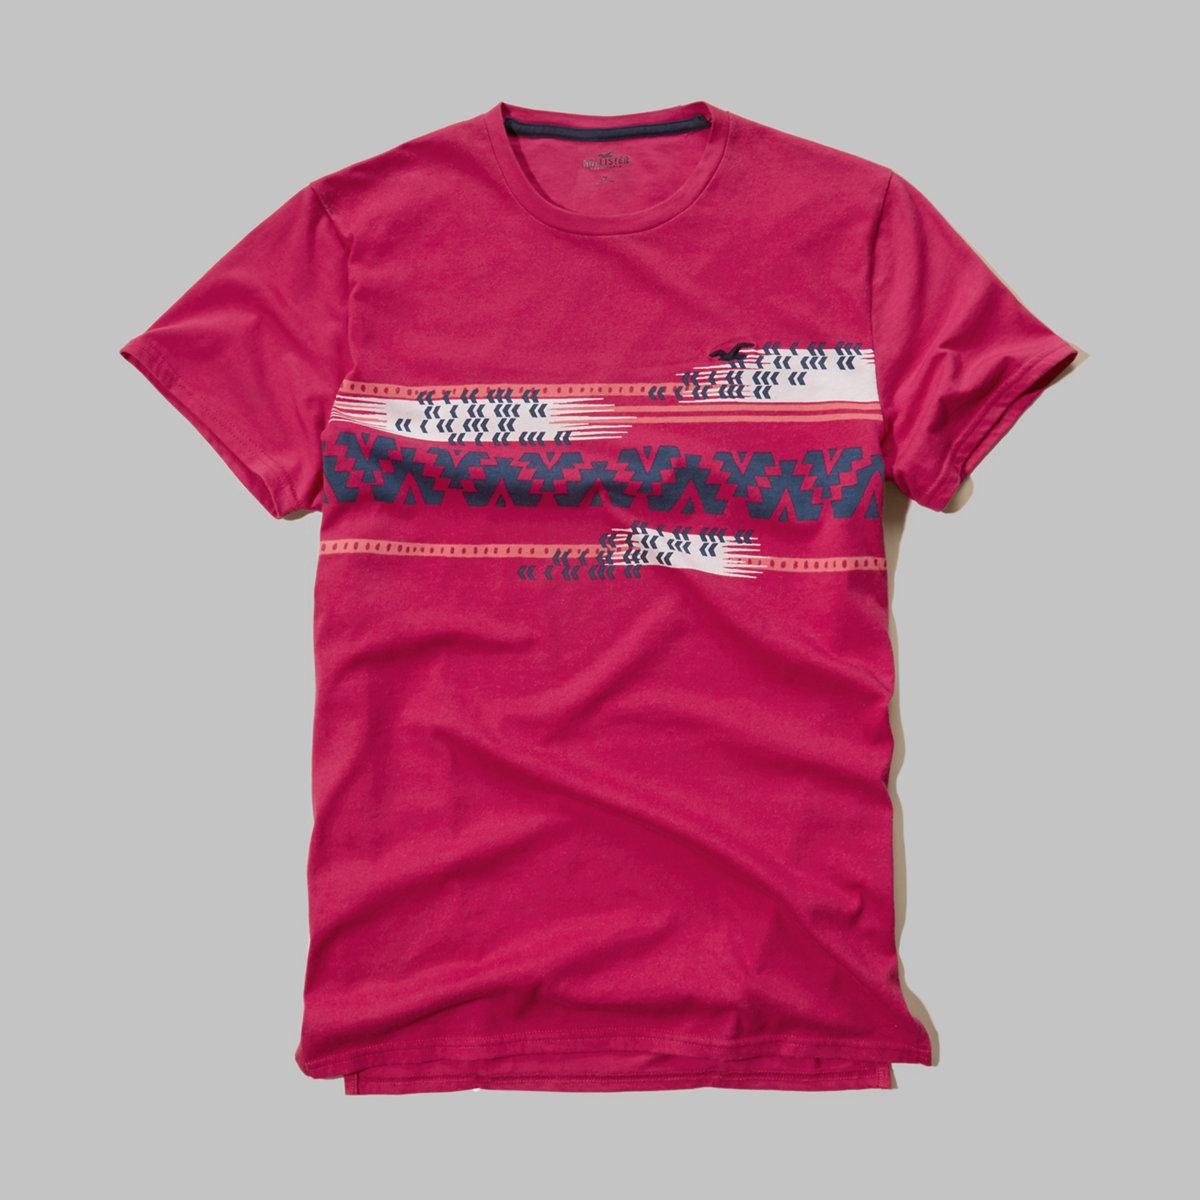 Patterned Jersey T-Shirt